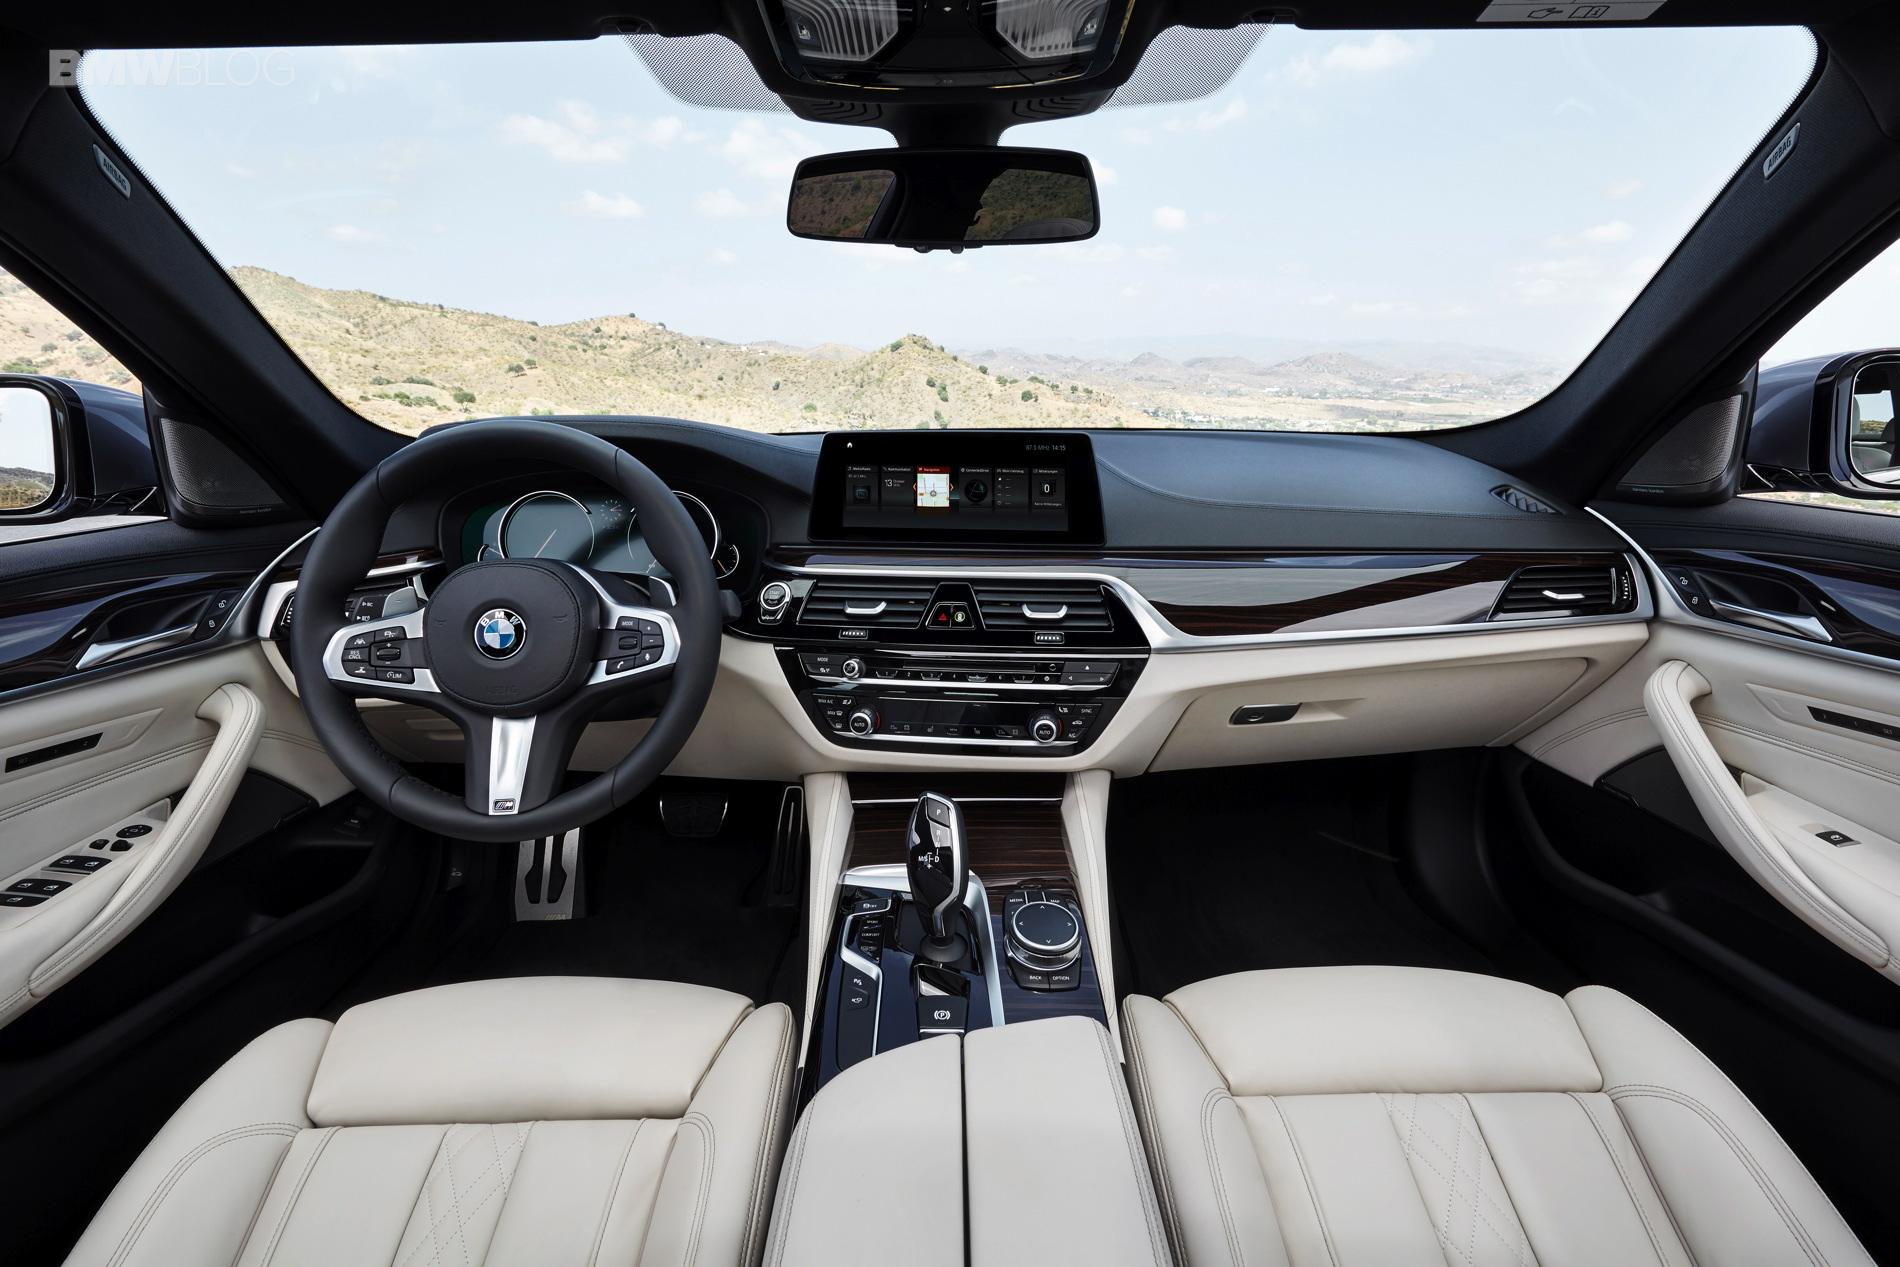 El nuevo BMW Serie 5 2017 llega a España: Tendrás que desembolsar mínimo 49.400 euros por él 2